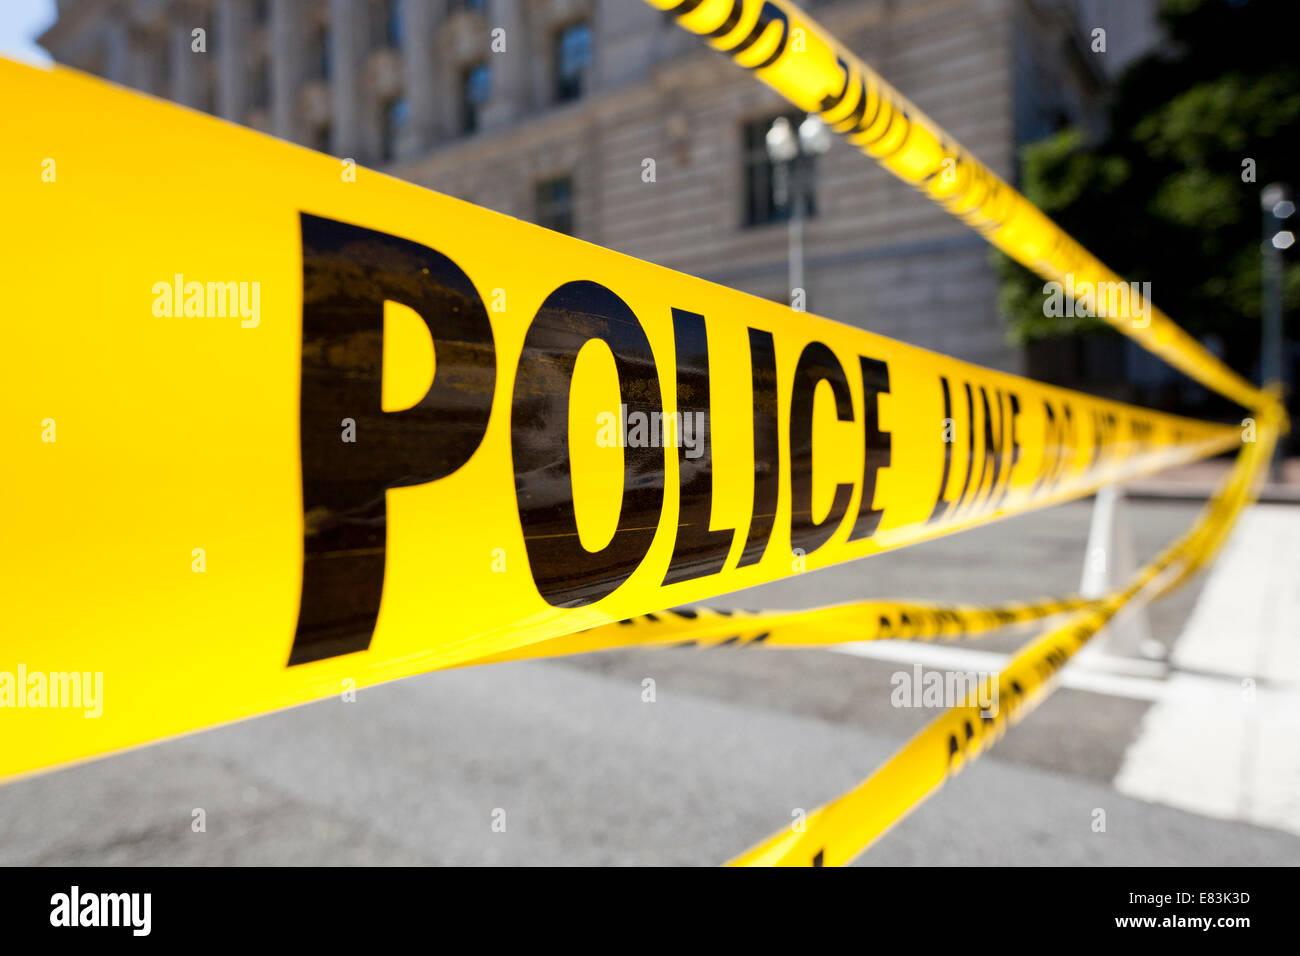 Police line tape closeup - USA - Stock Image